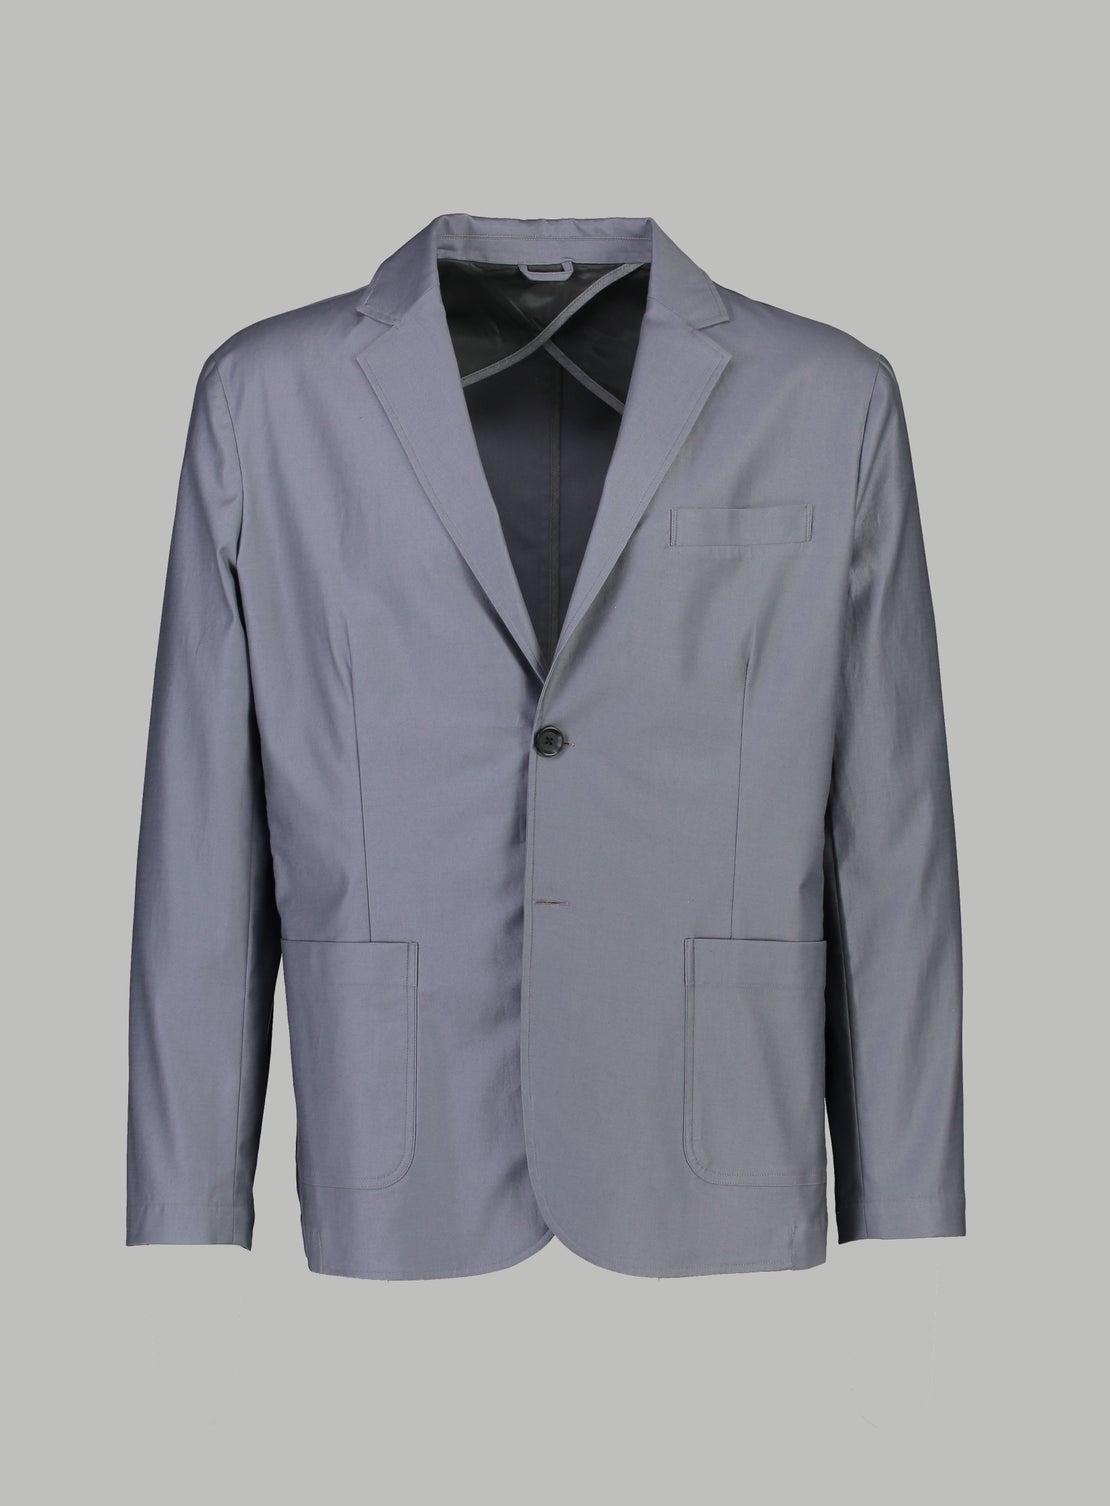 Foster Dove Grey Jacket